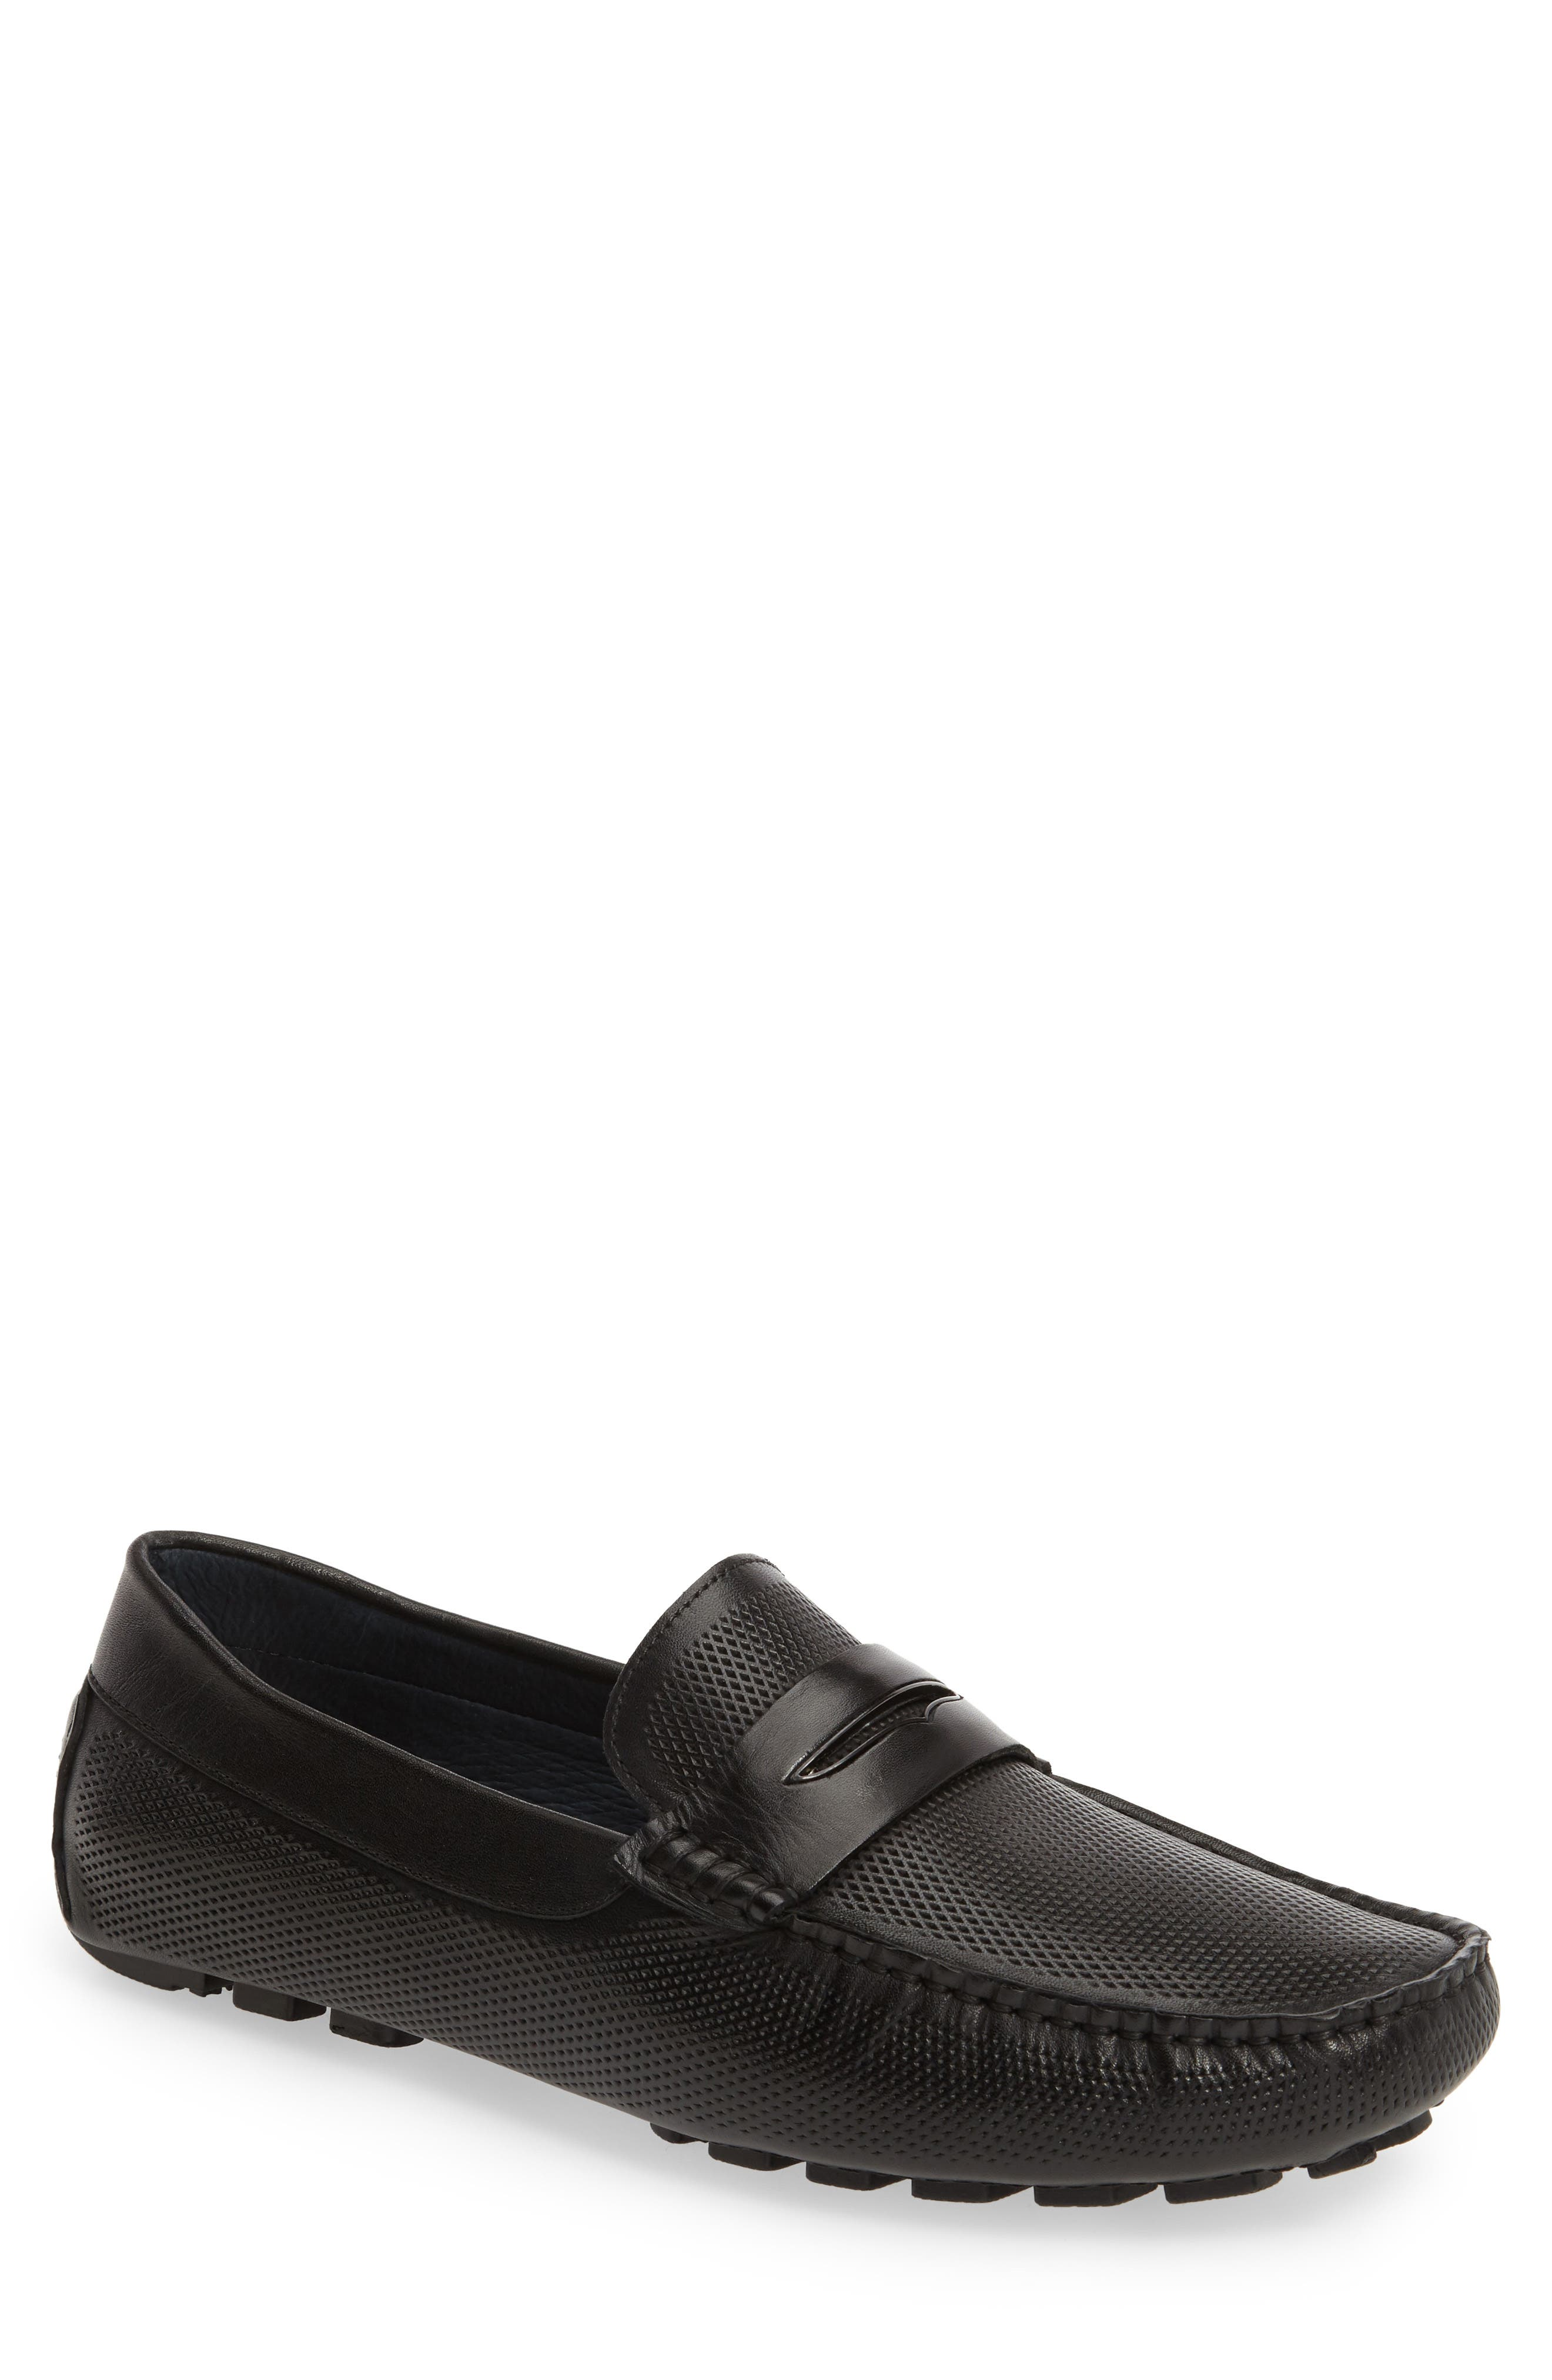 Mondrian Driving Shoe,                         Main,                         color, 001